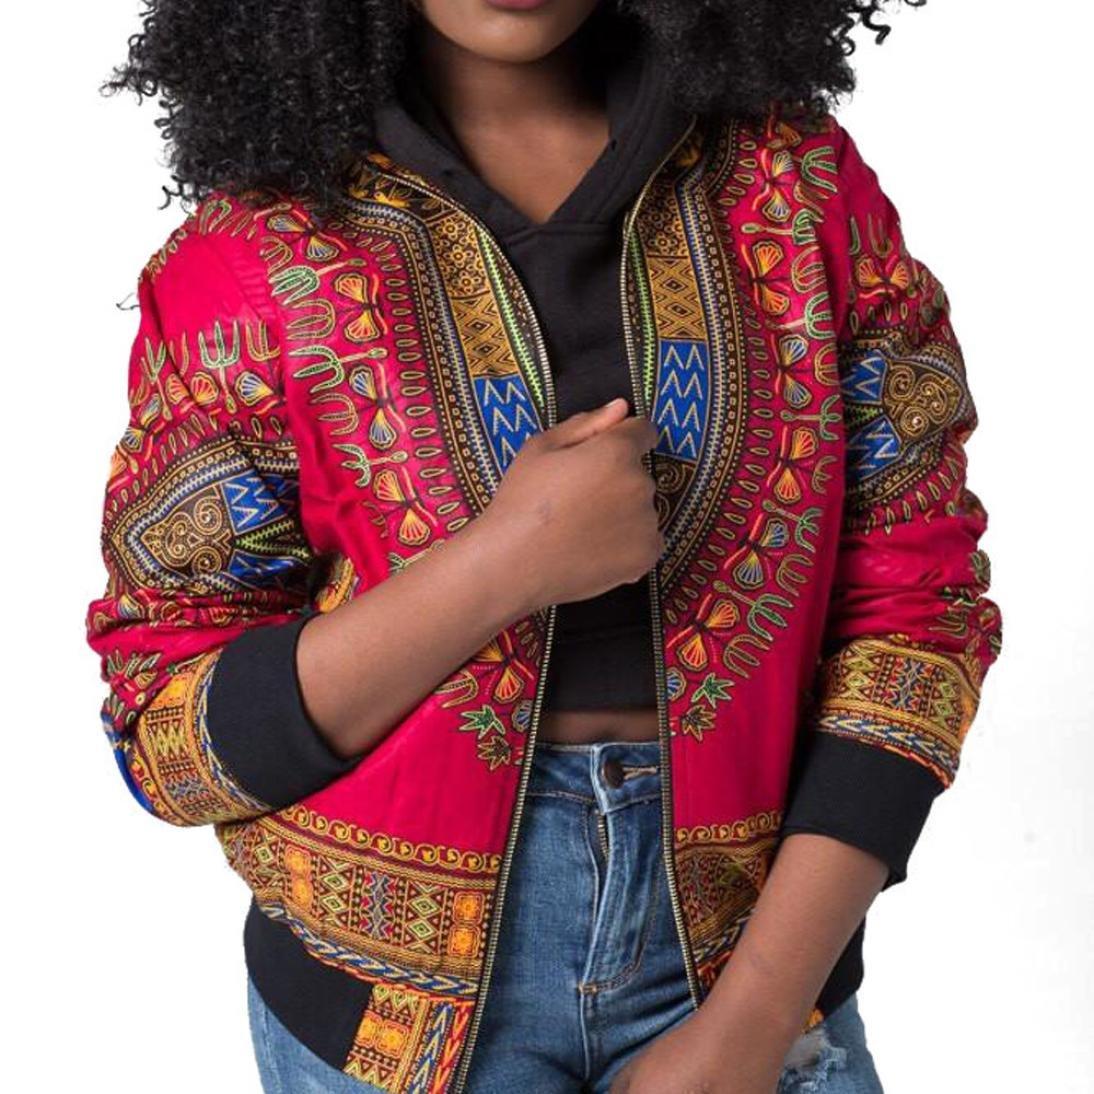 Women African Dashiki Long Sleeve Coat Biker Bomber Outwear Short Zip Up Jacket iQKA0706